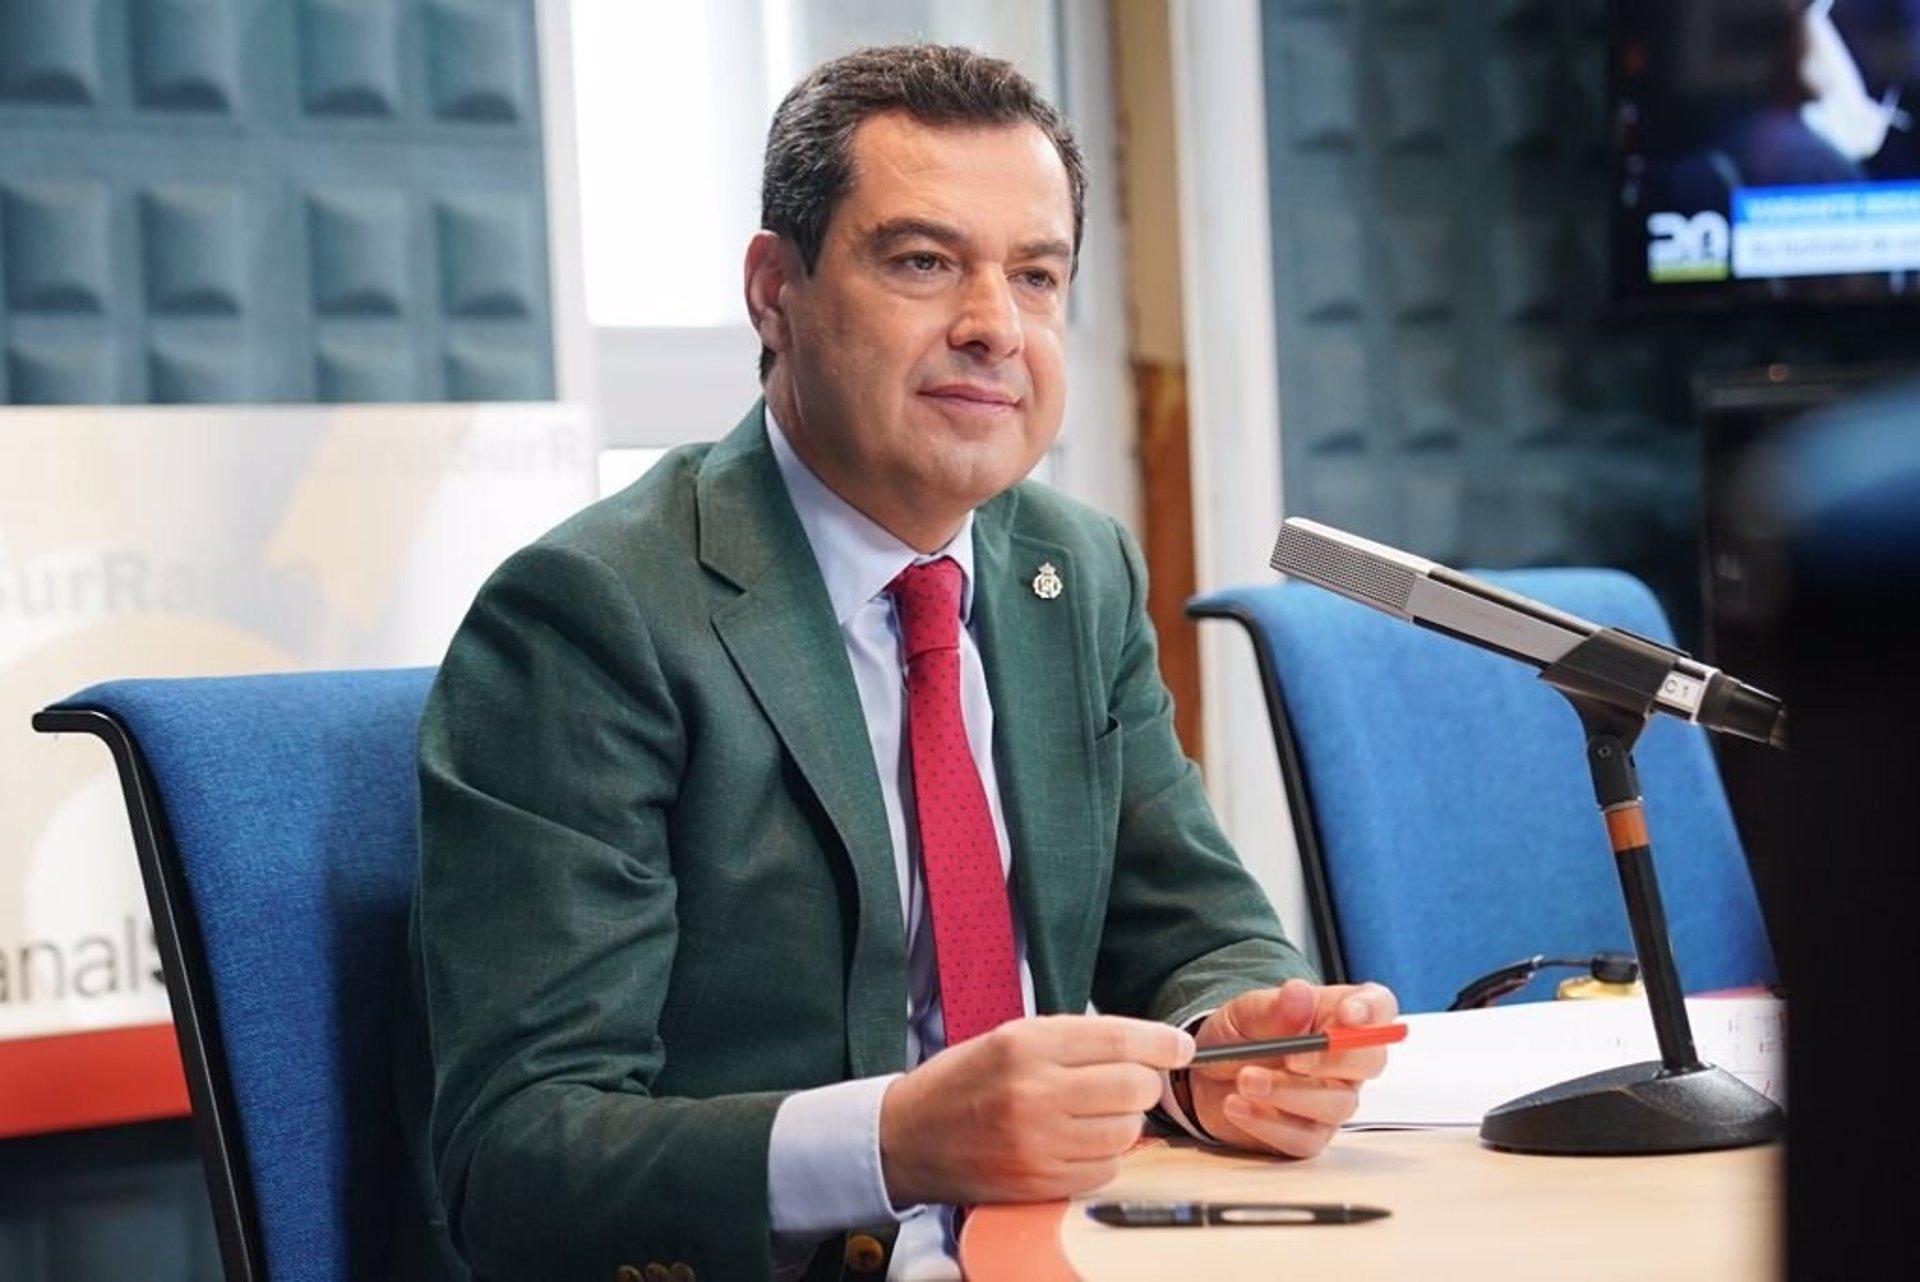 Moreno plantea a Ximo Puig un «frente común» Andalucía-Valencia para reclamar al Gobierno una financiación justa